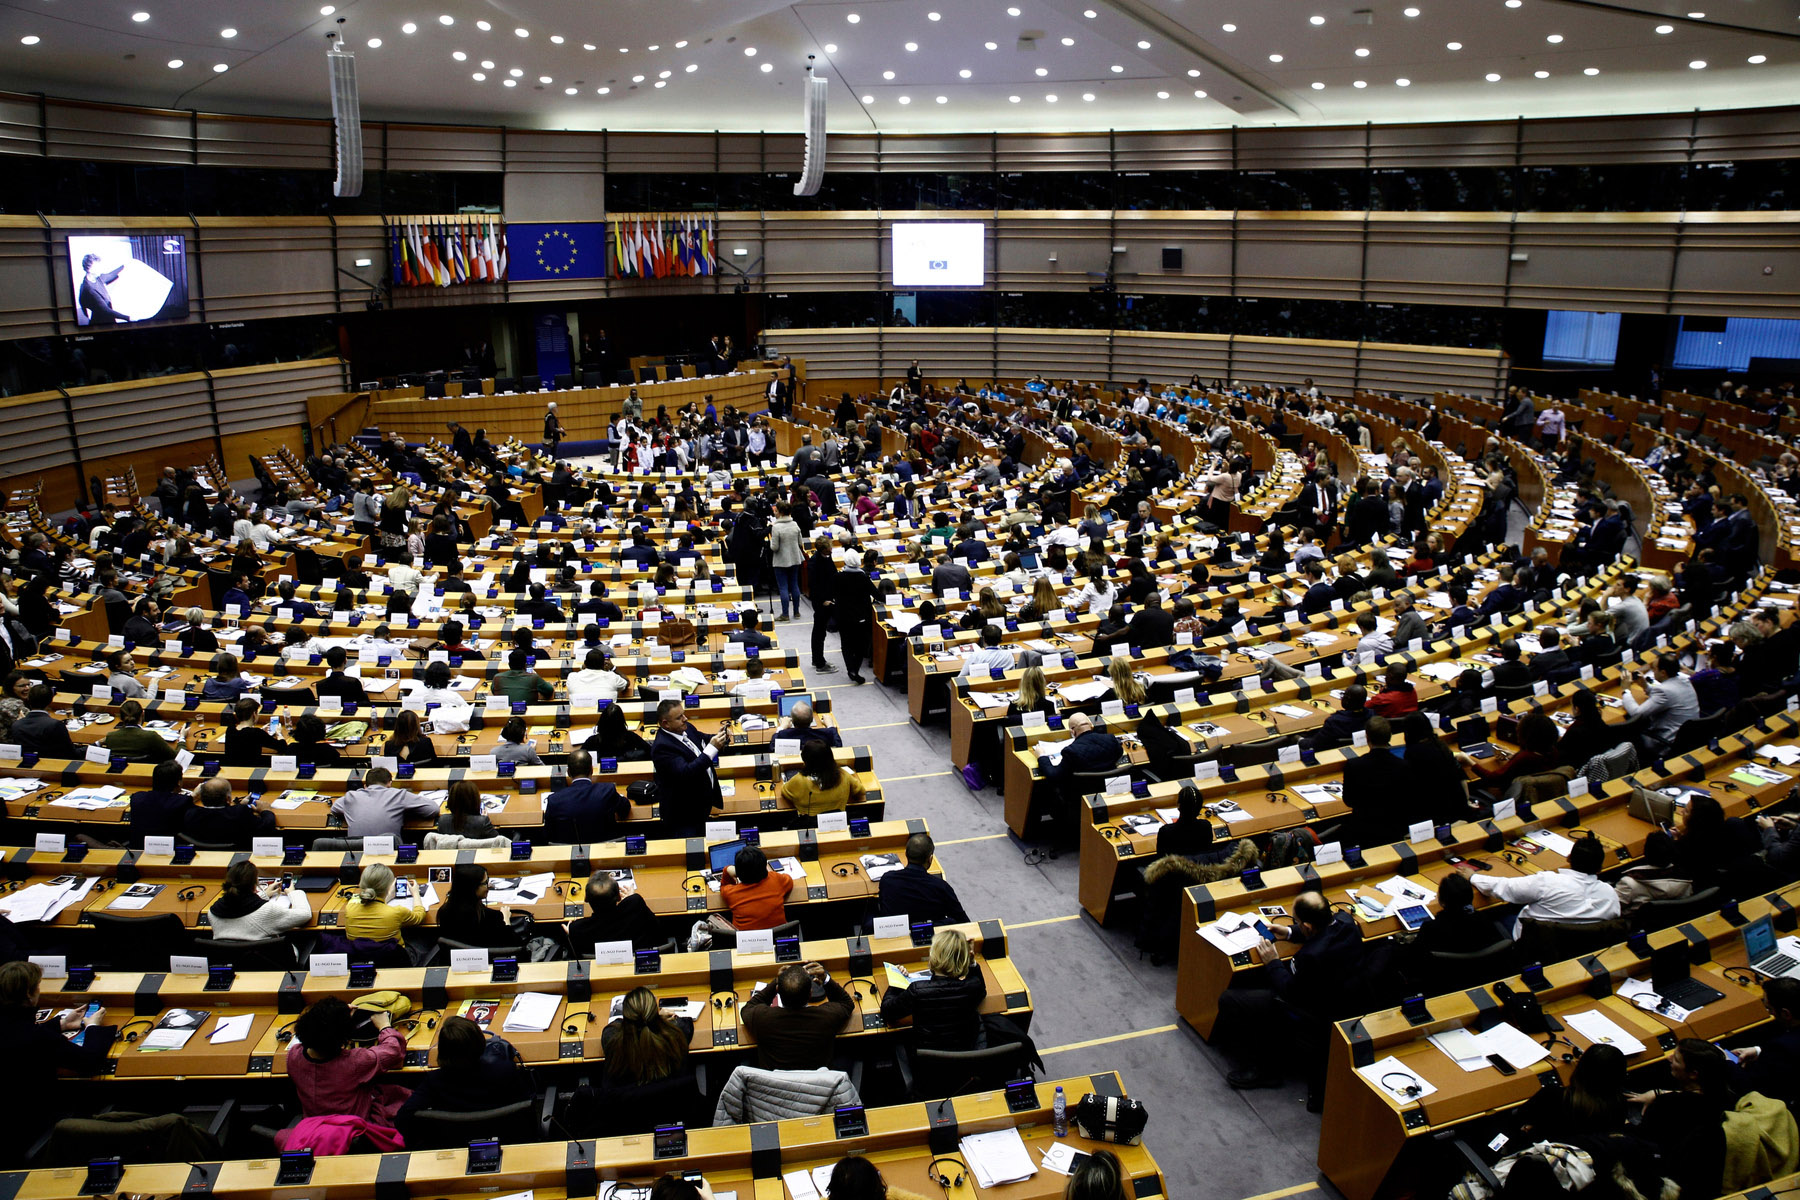 European Parliament plenary room